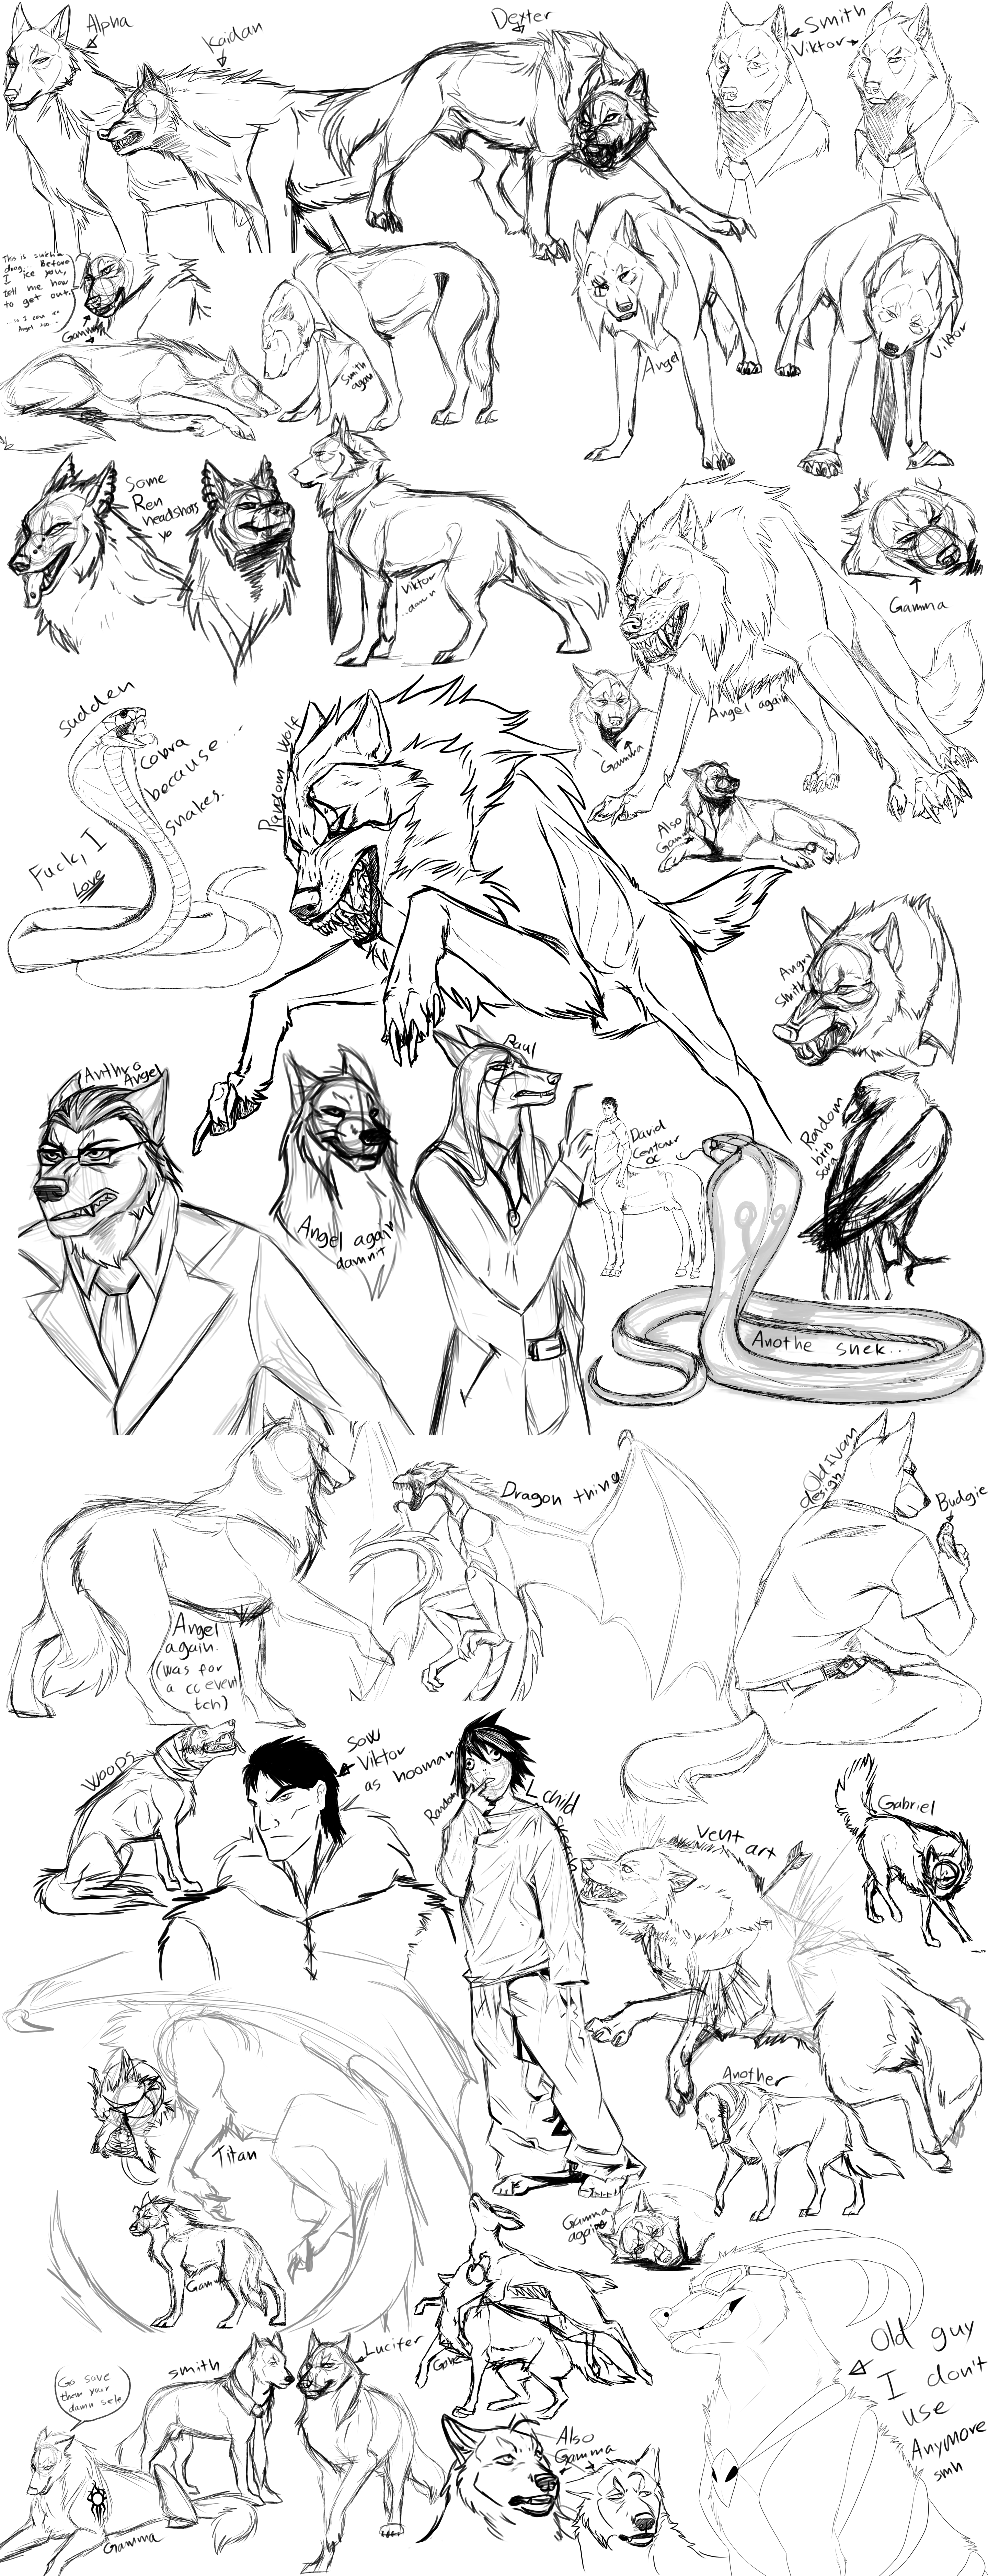 Sketch Dump 2016 by CXCR